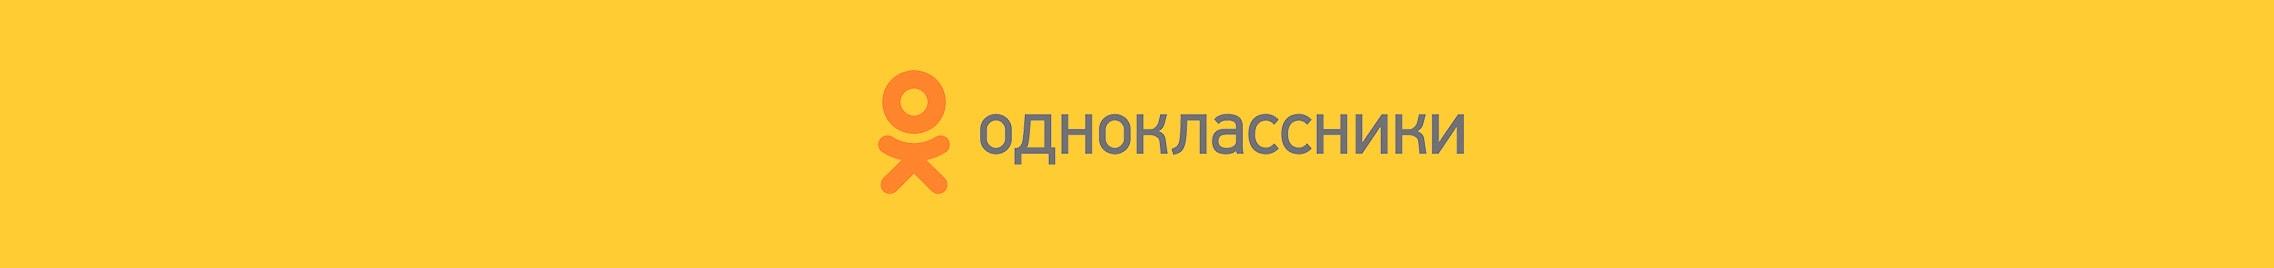 одноклассники подписчики